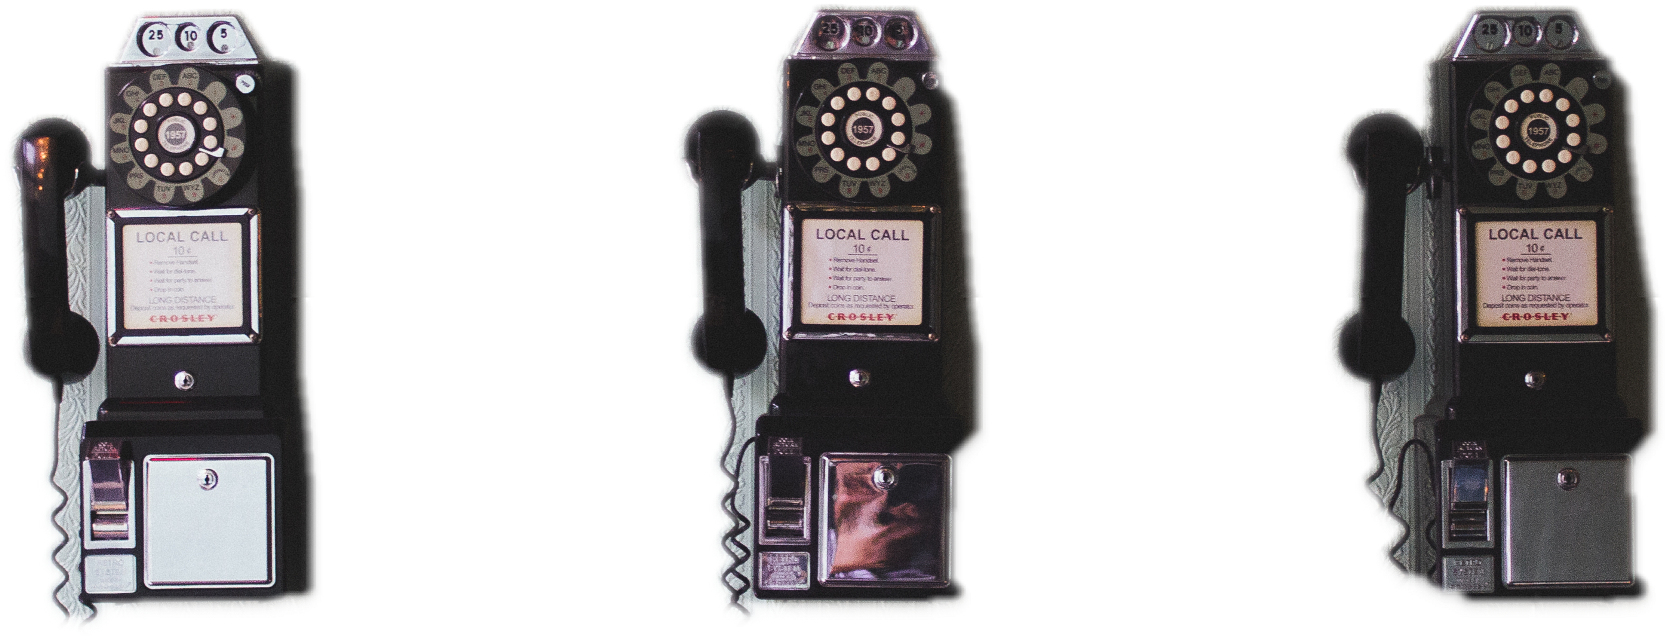 #FreeToEdit #ftestickers #telephone